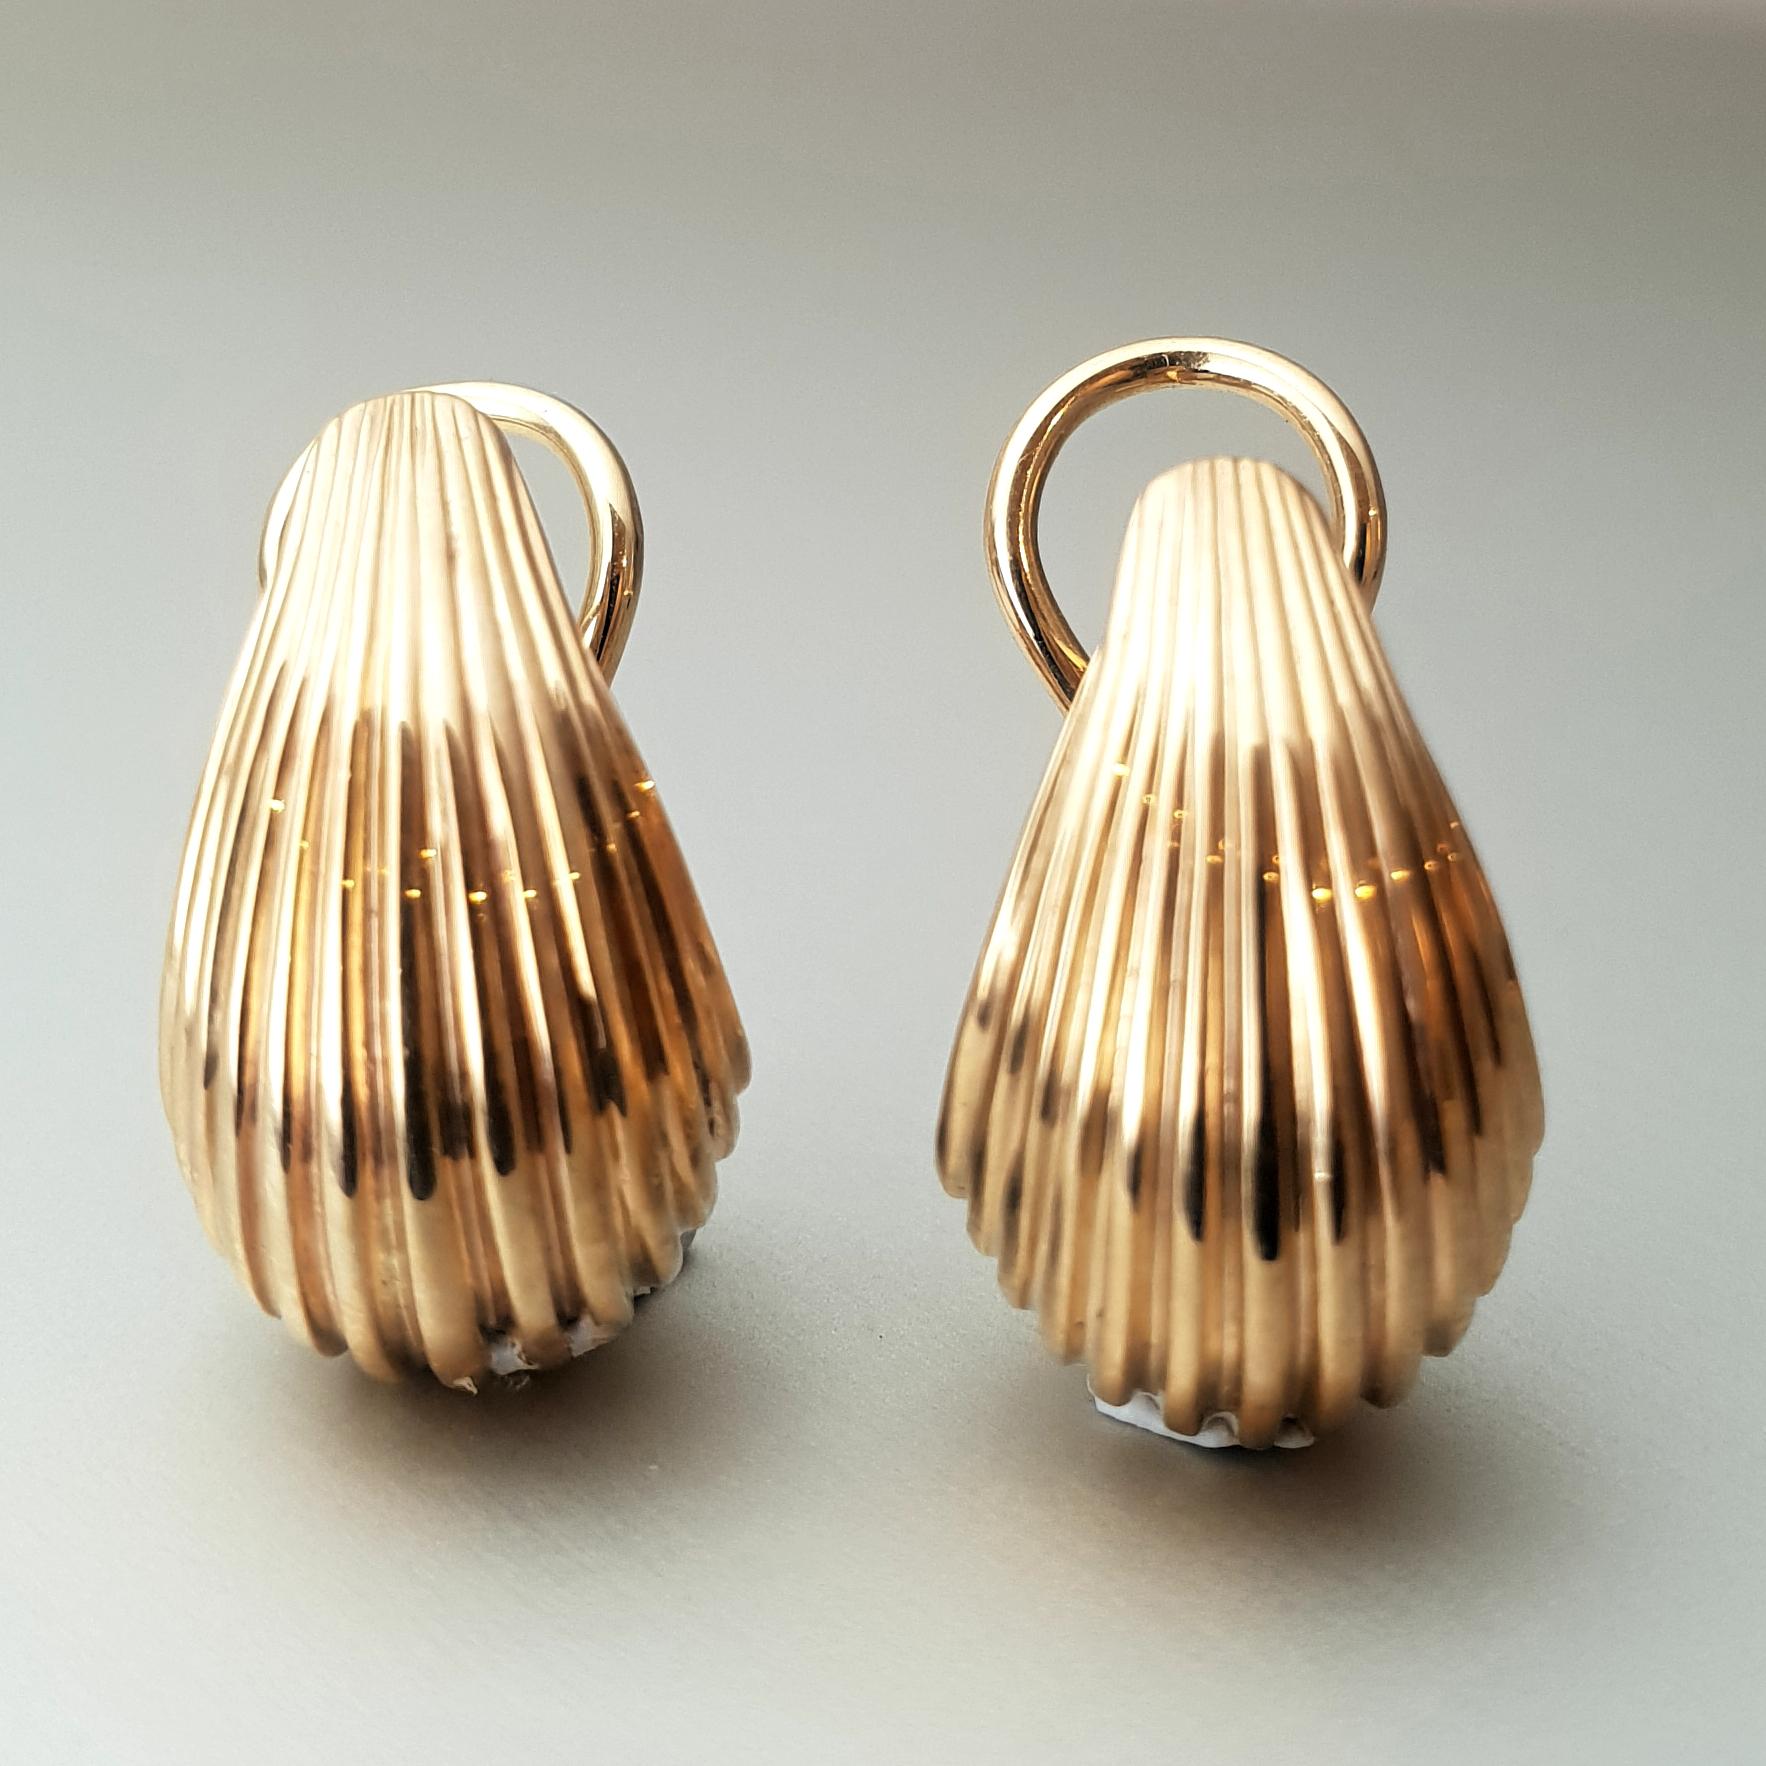 'Bundova' Earrings in 9ct Yellow Gold